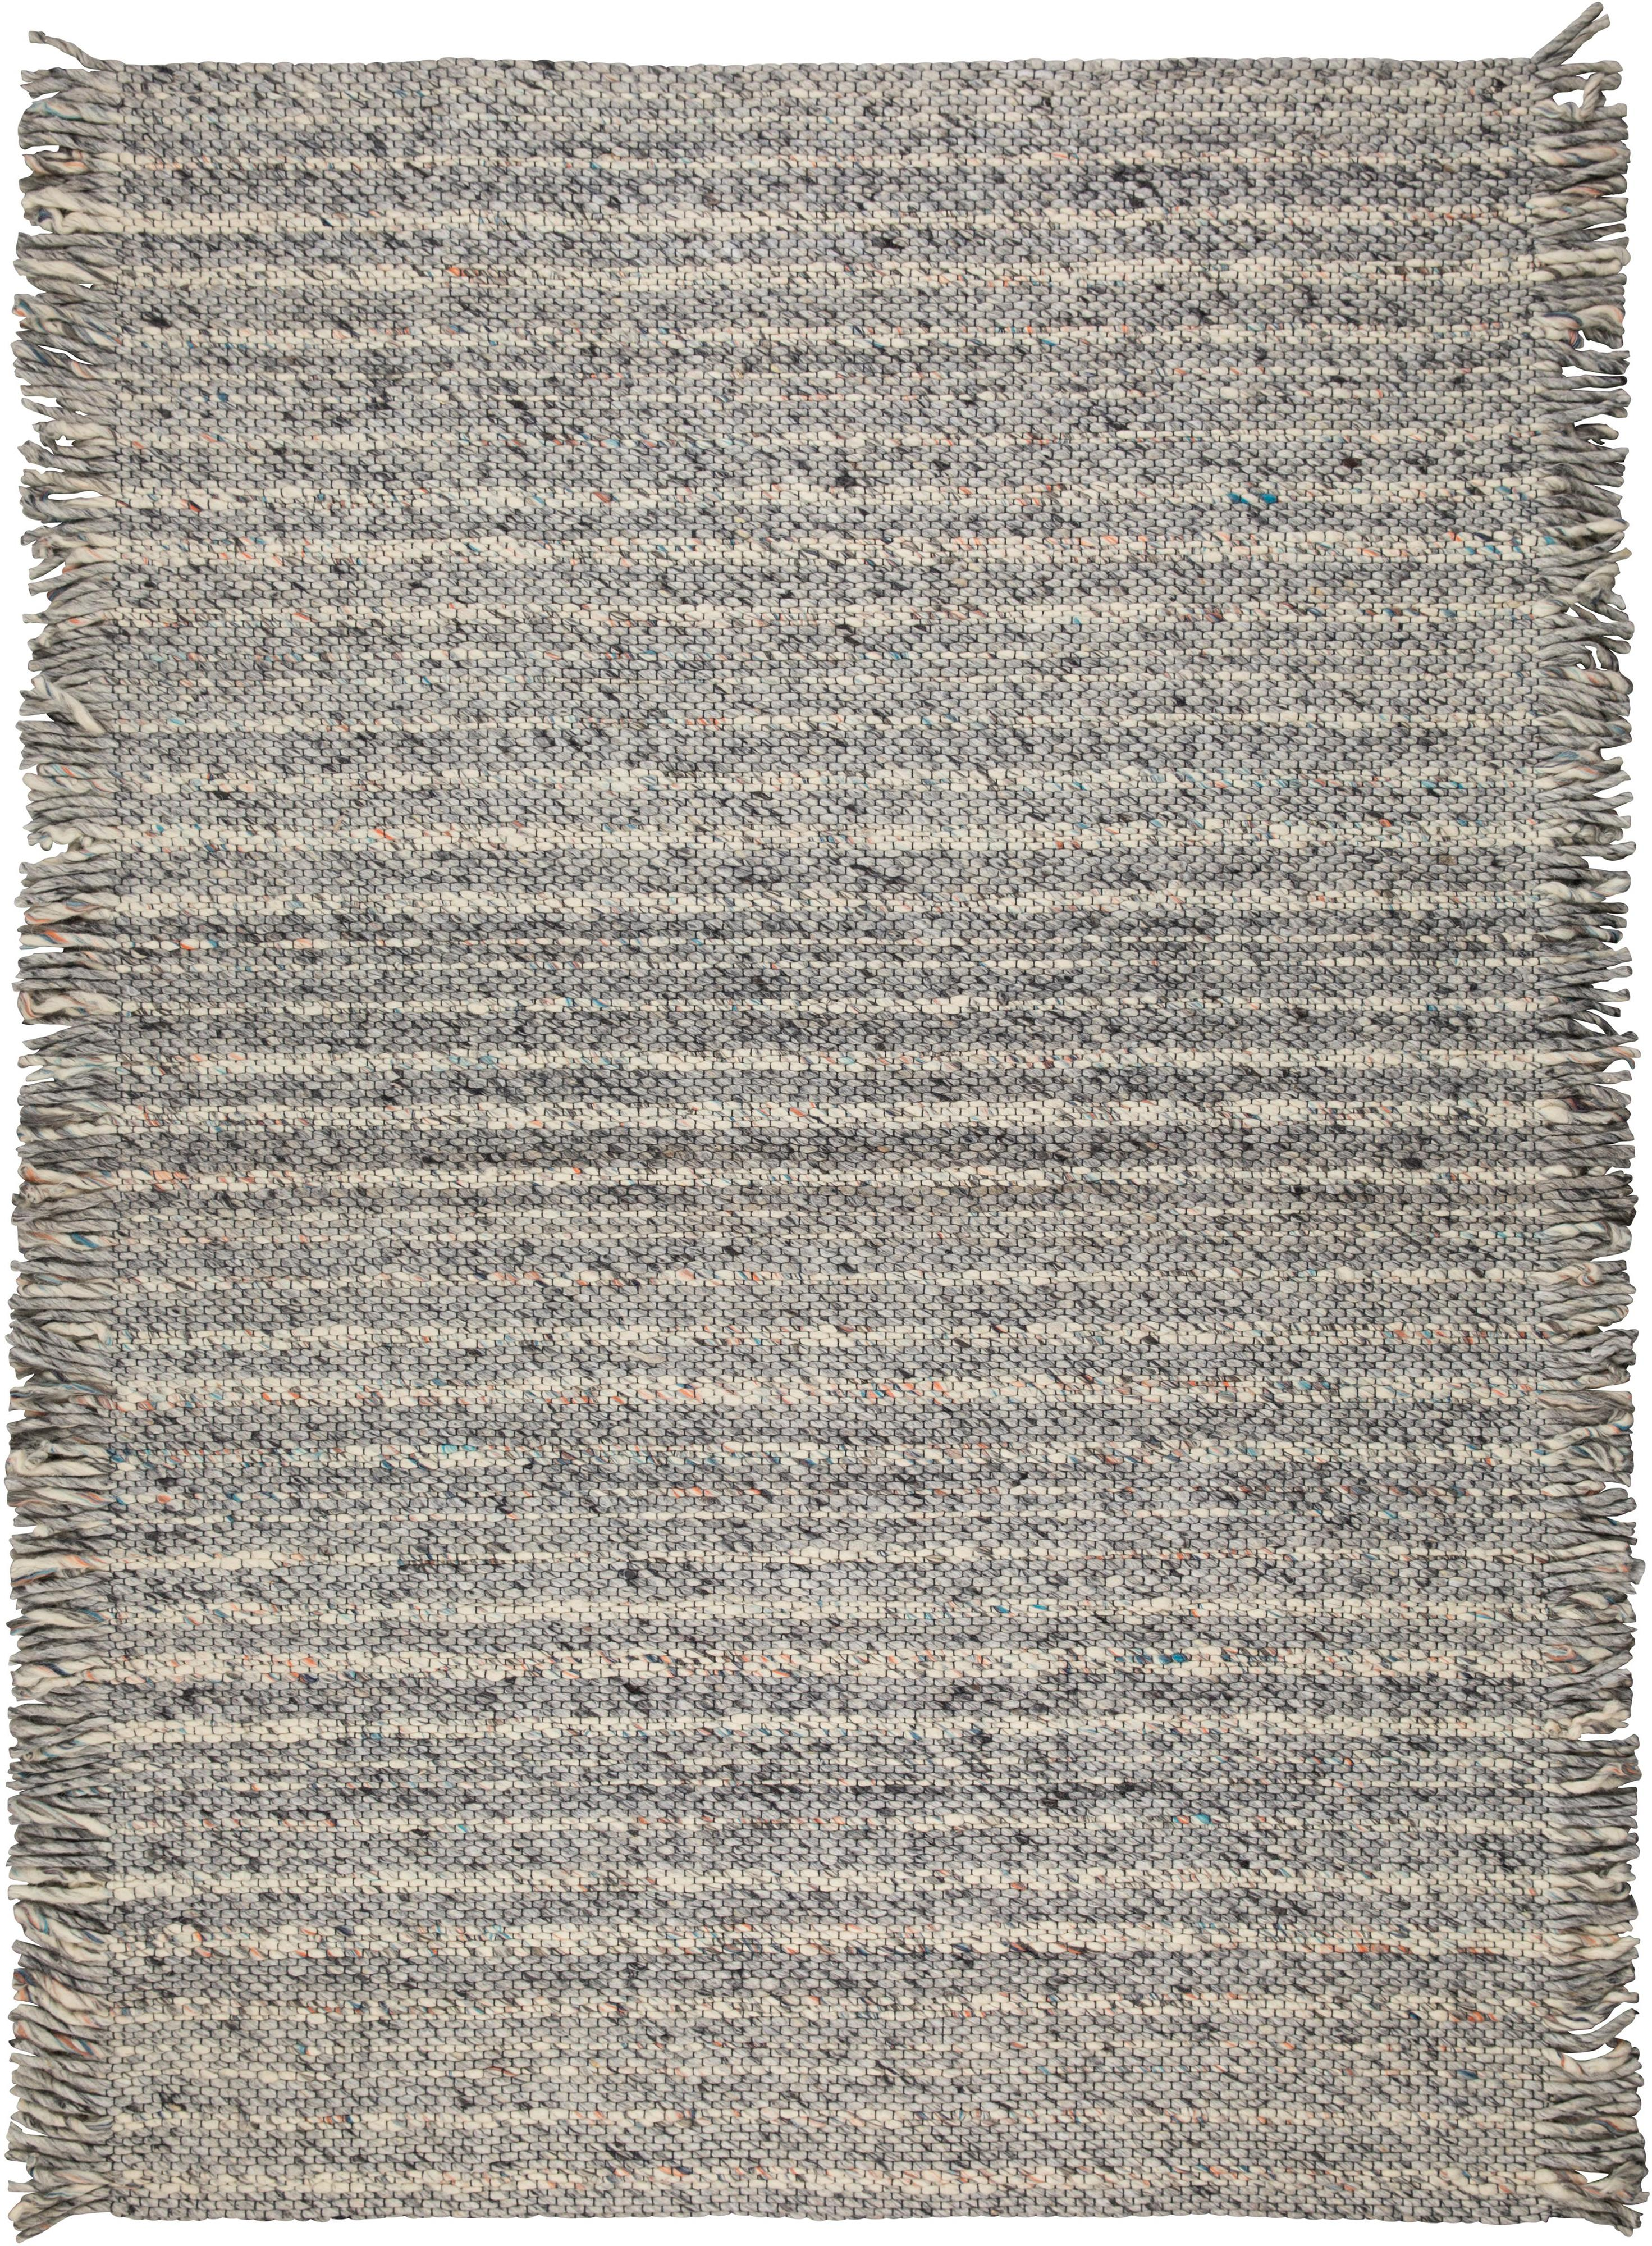 Alfombra de lana con flecos Fransen, Parte superior: 100%lana, Reverso: algodón Las alfombras de , Gris, beige, An 170 x L 240 cm (Tamaño M)